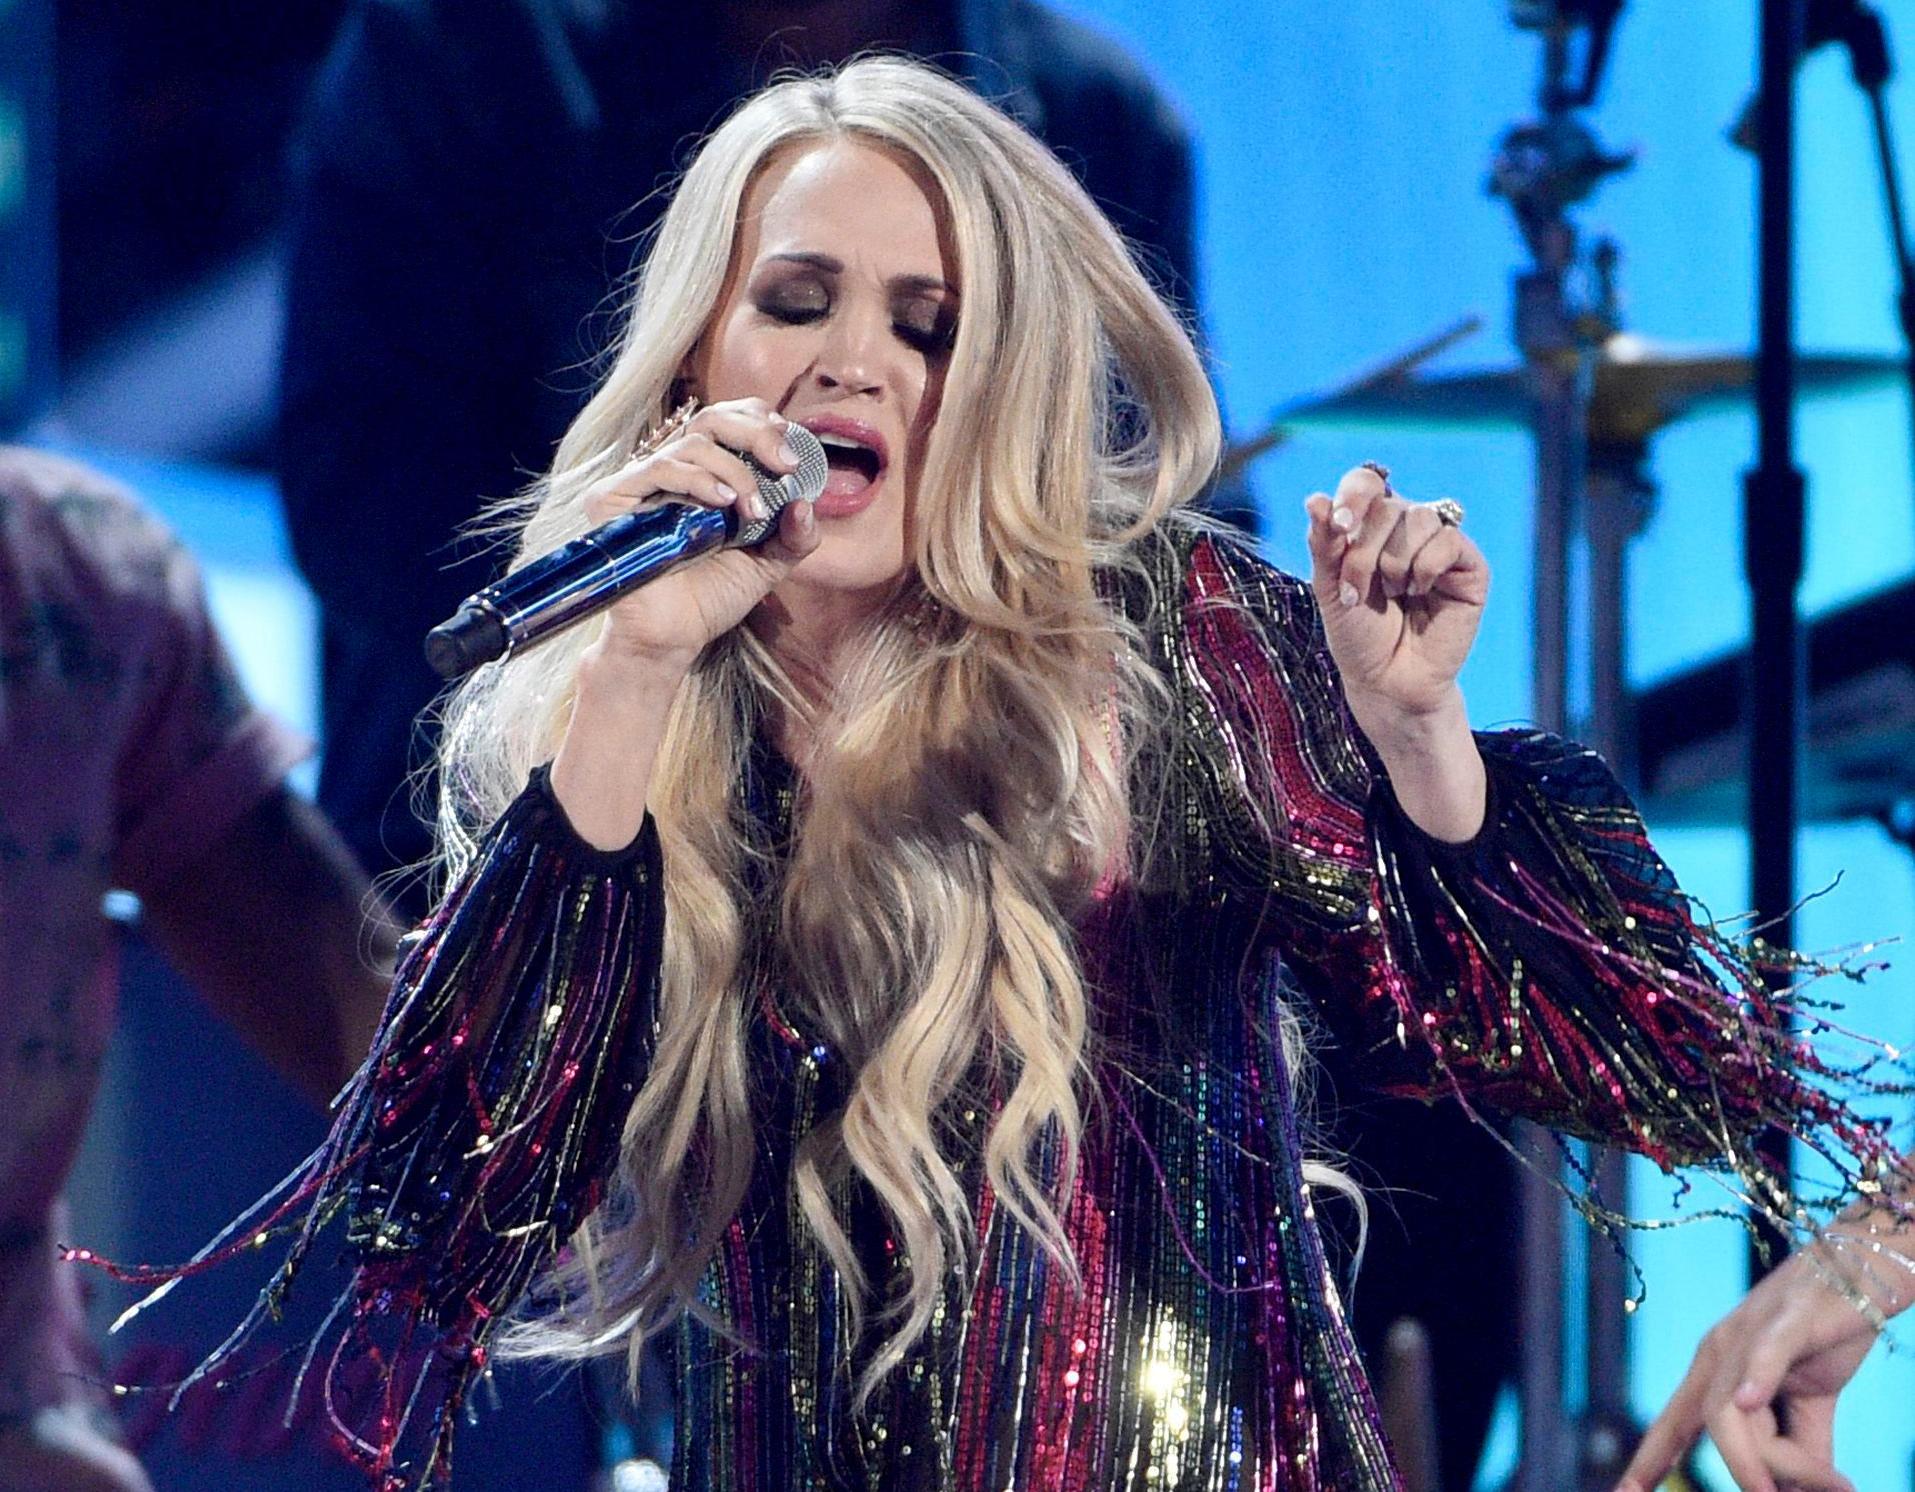 2019 CMT Music Awards: Carrie Underwood, Maren Morris to Perform